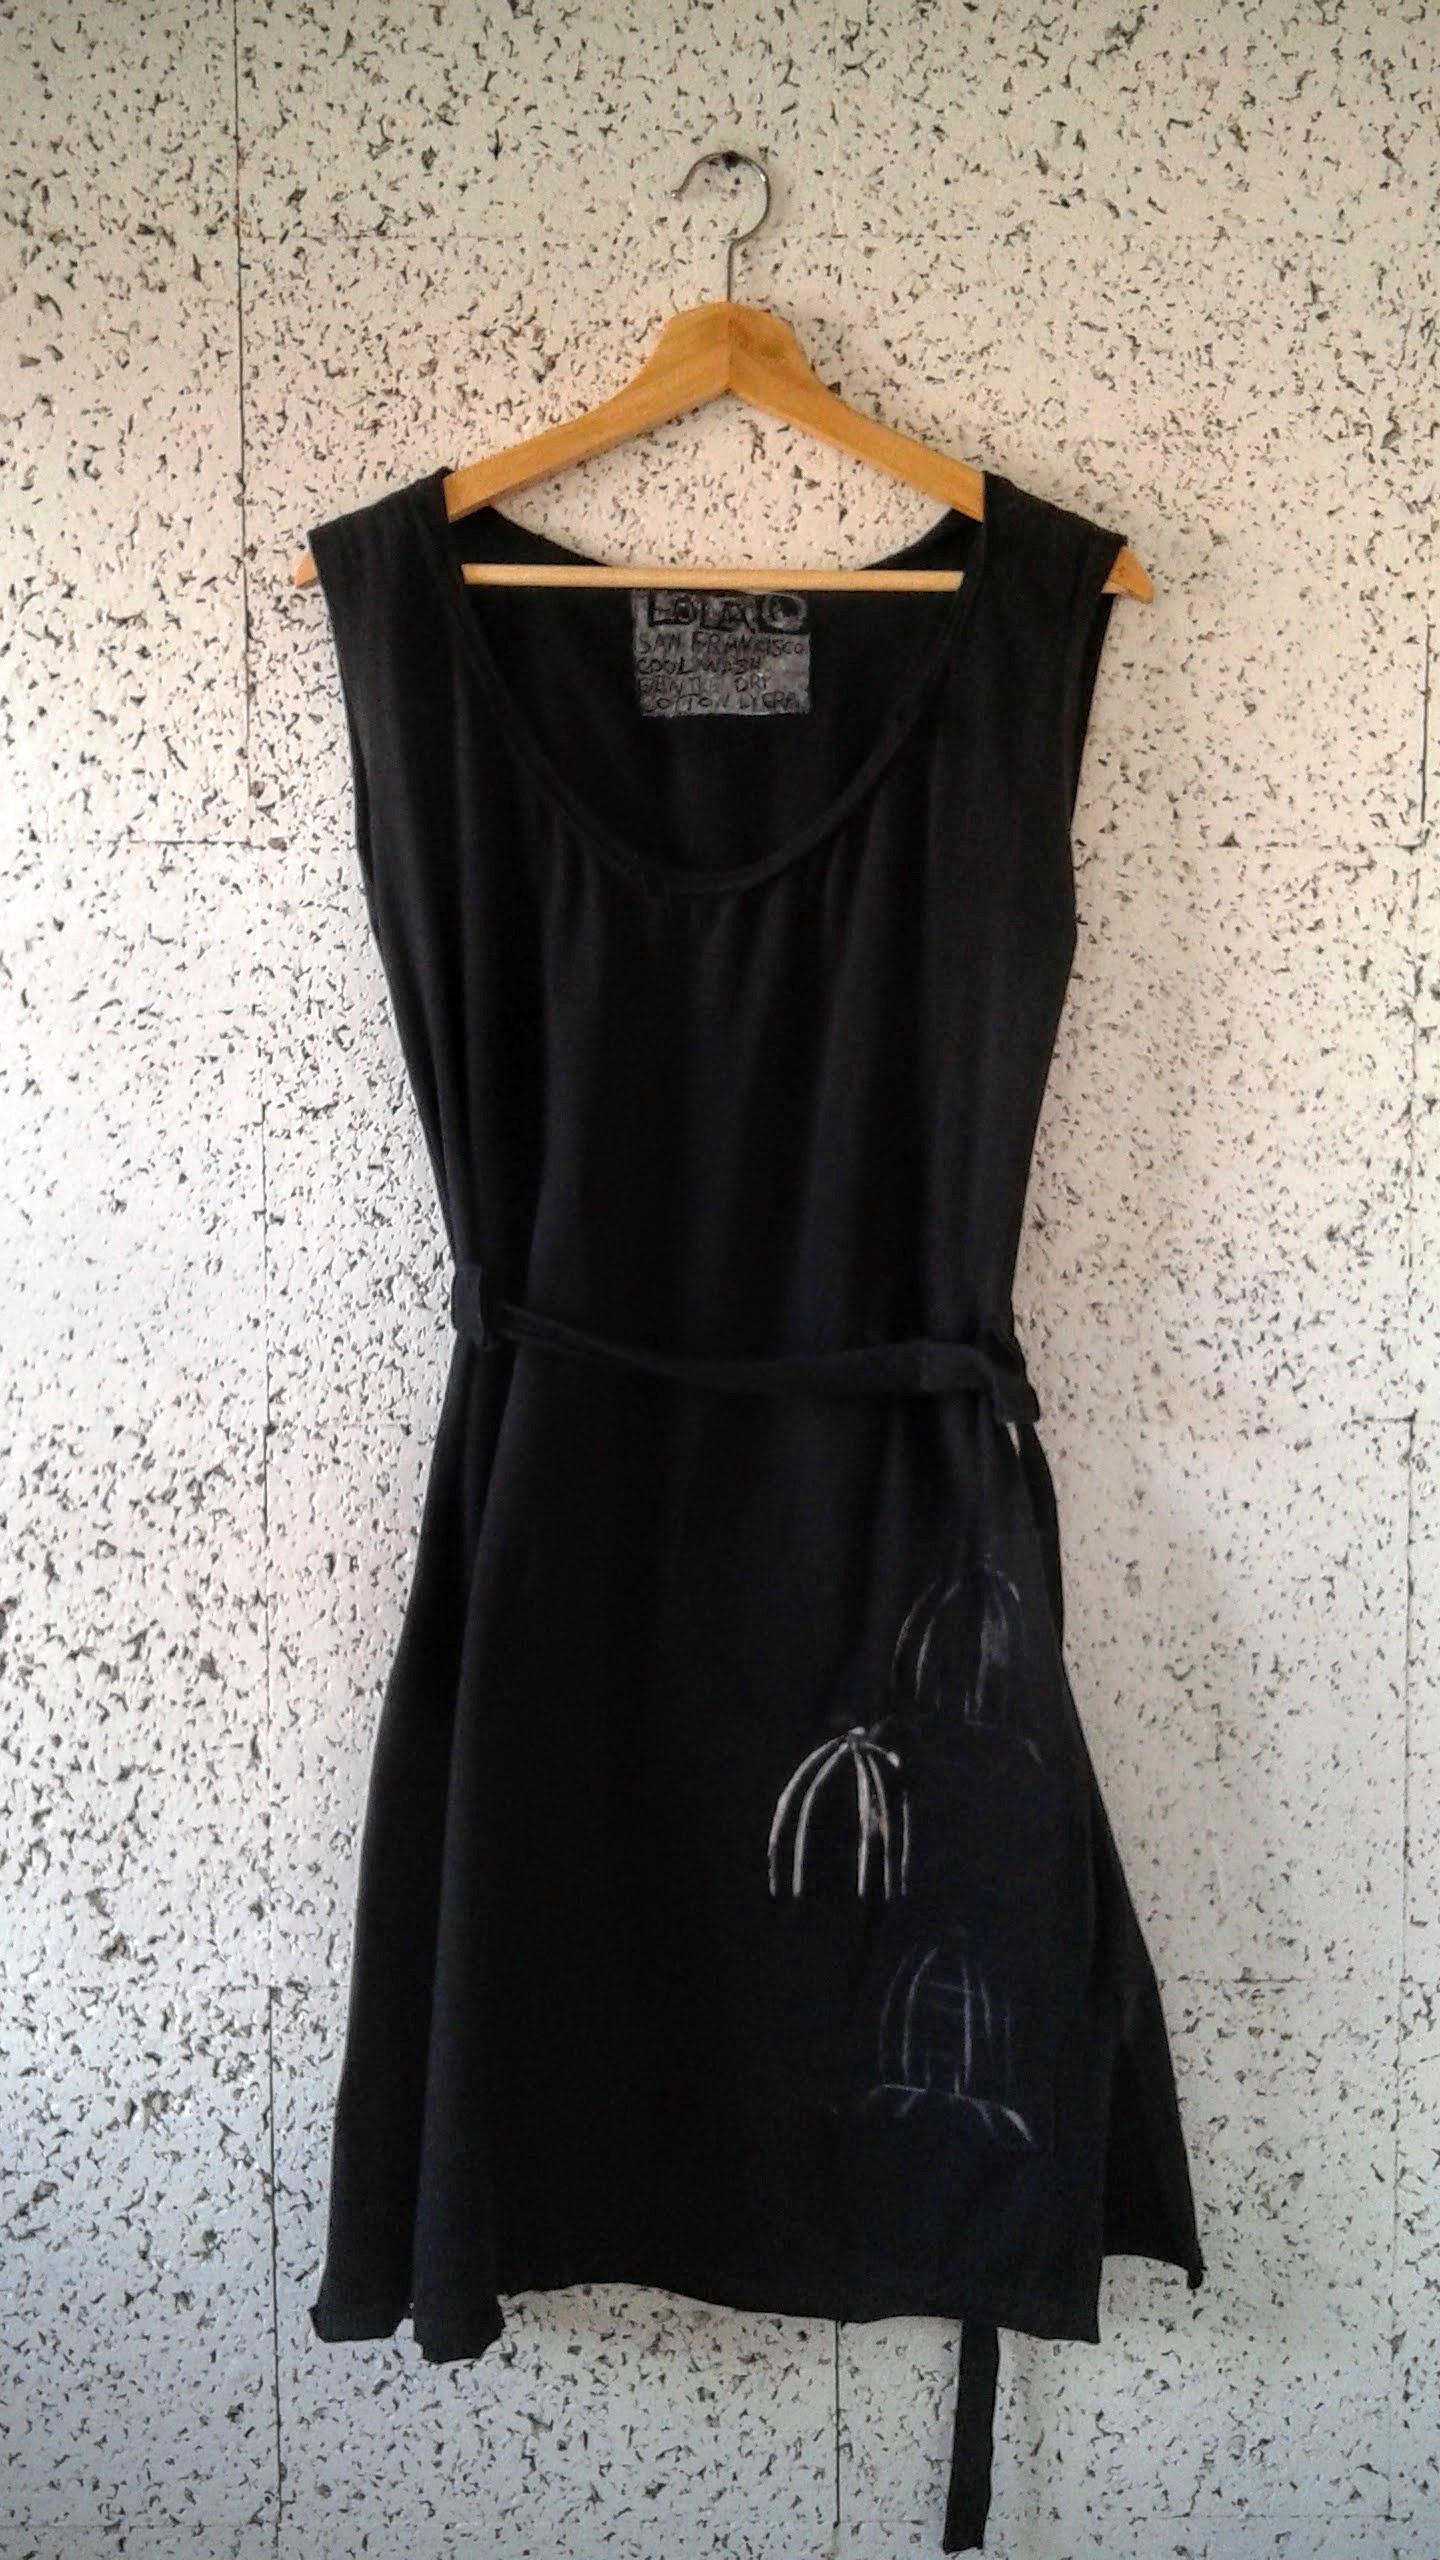 Lola of San Francisco dress; Size M, $30